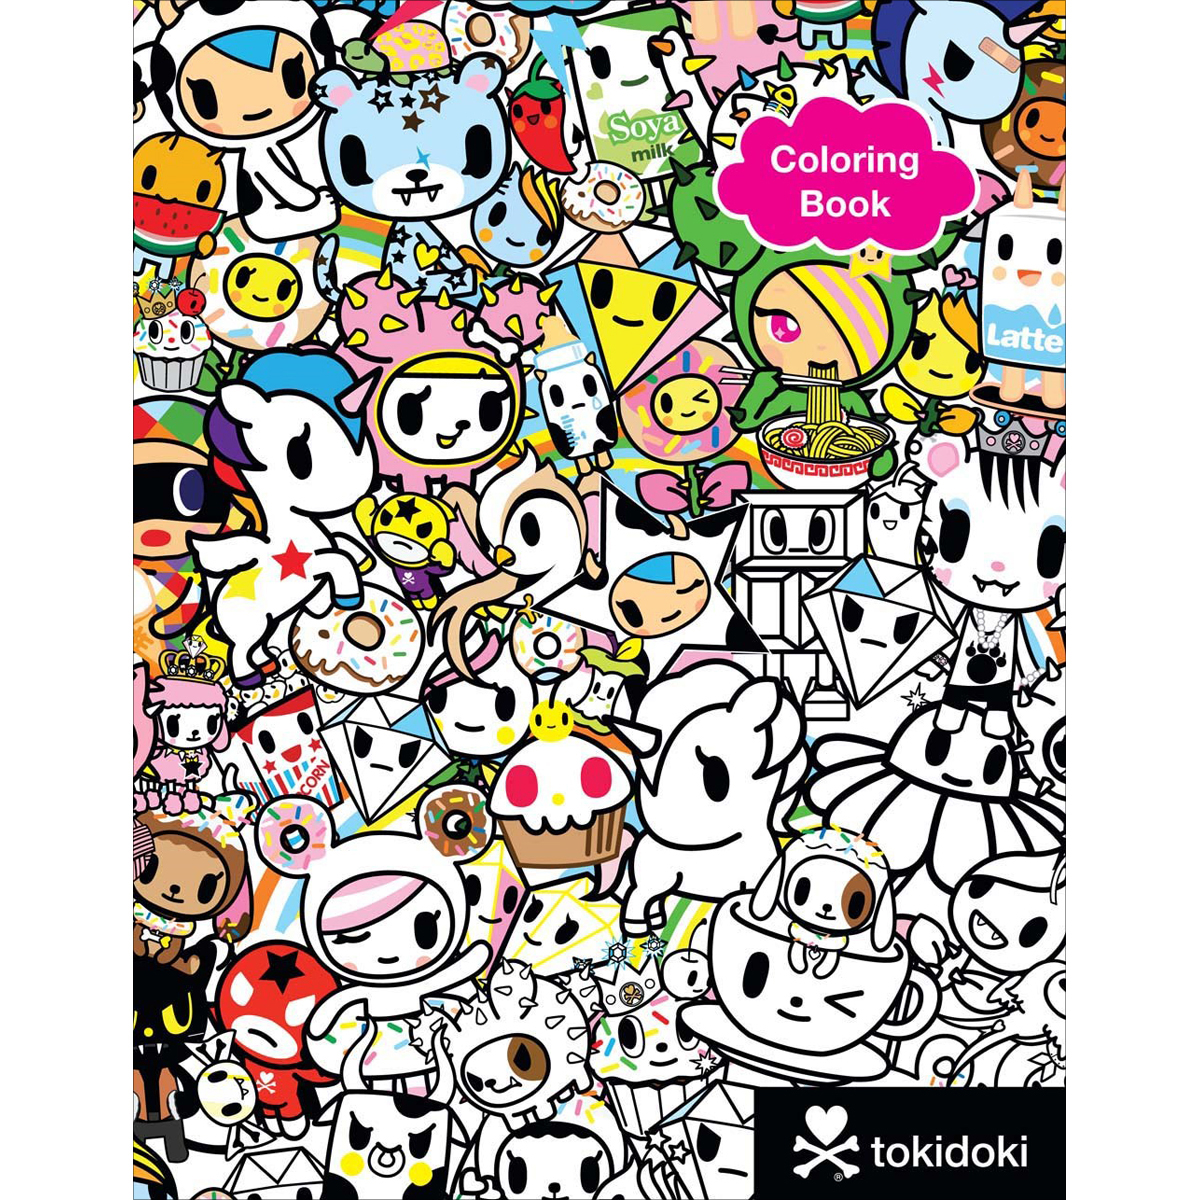 - Sterling Publishing-Tokidoki Coloring Book - Walmart.com - Walmart.com